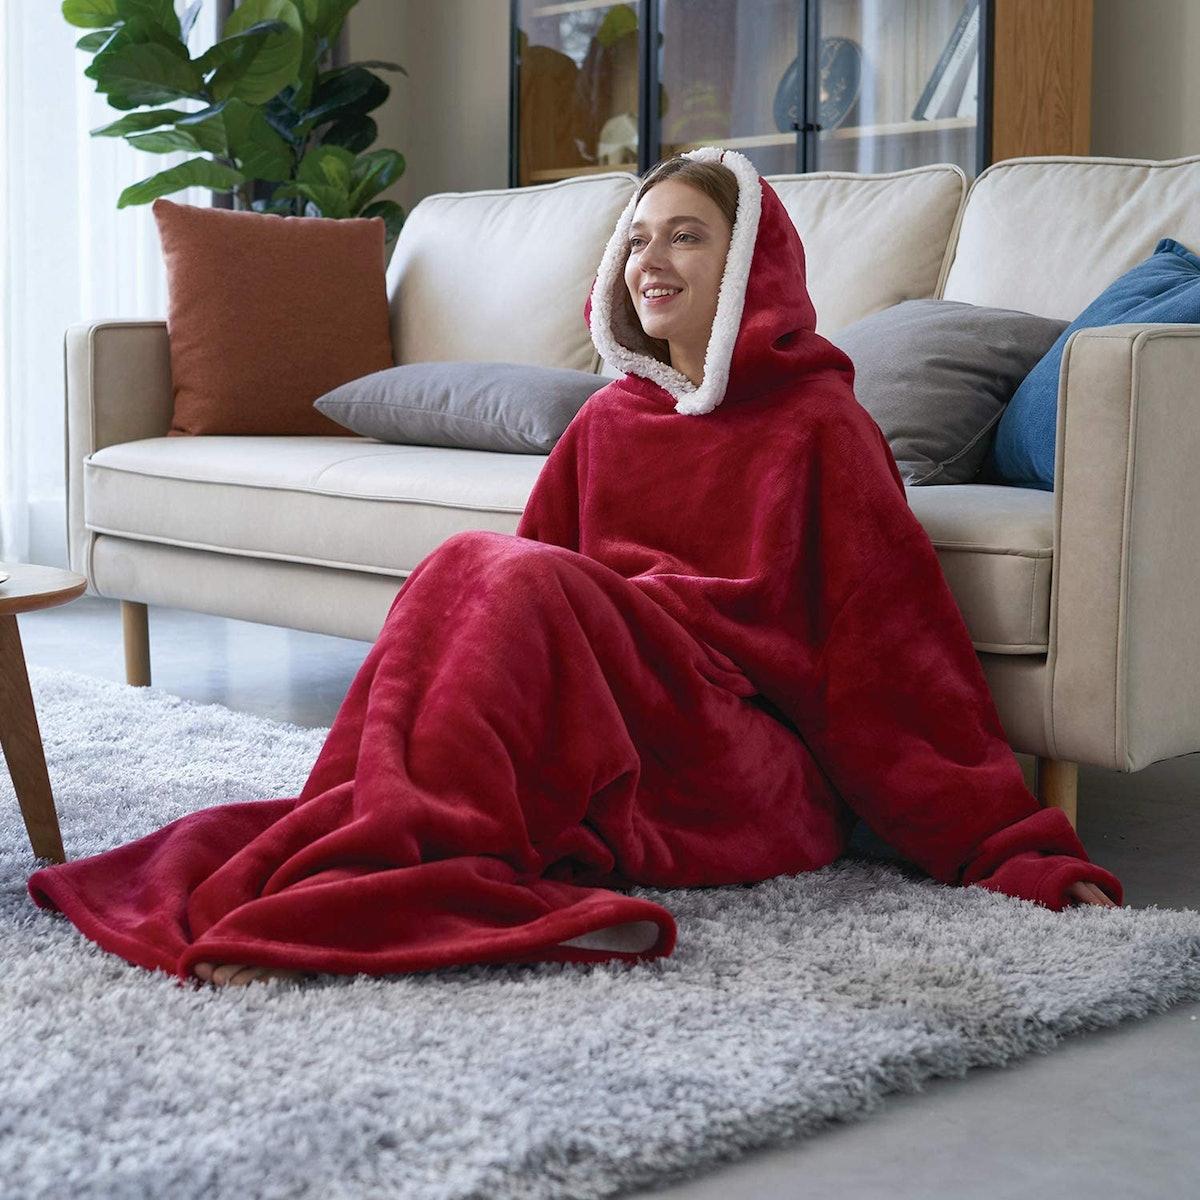 Eheyciga Blanket Hoodie with Pockets